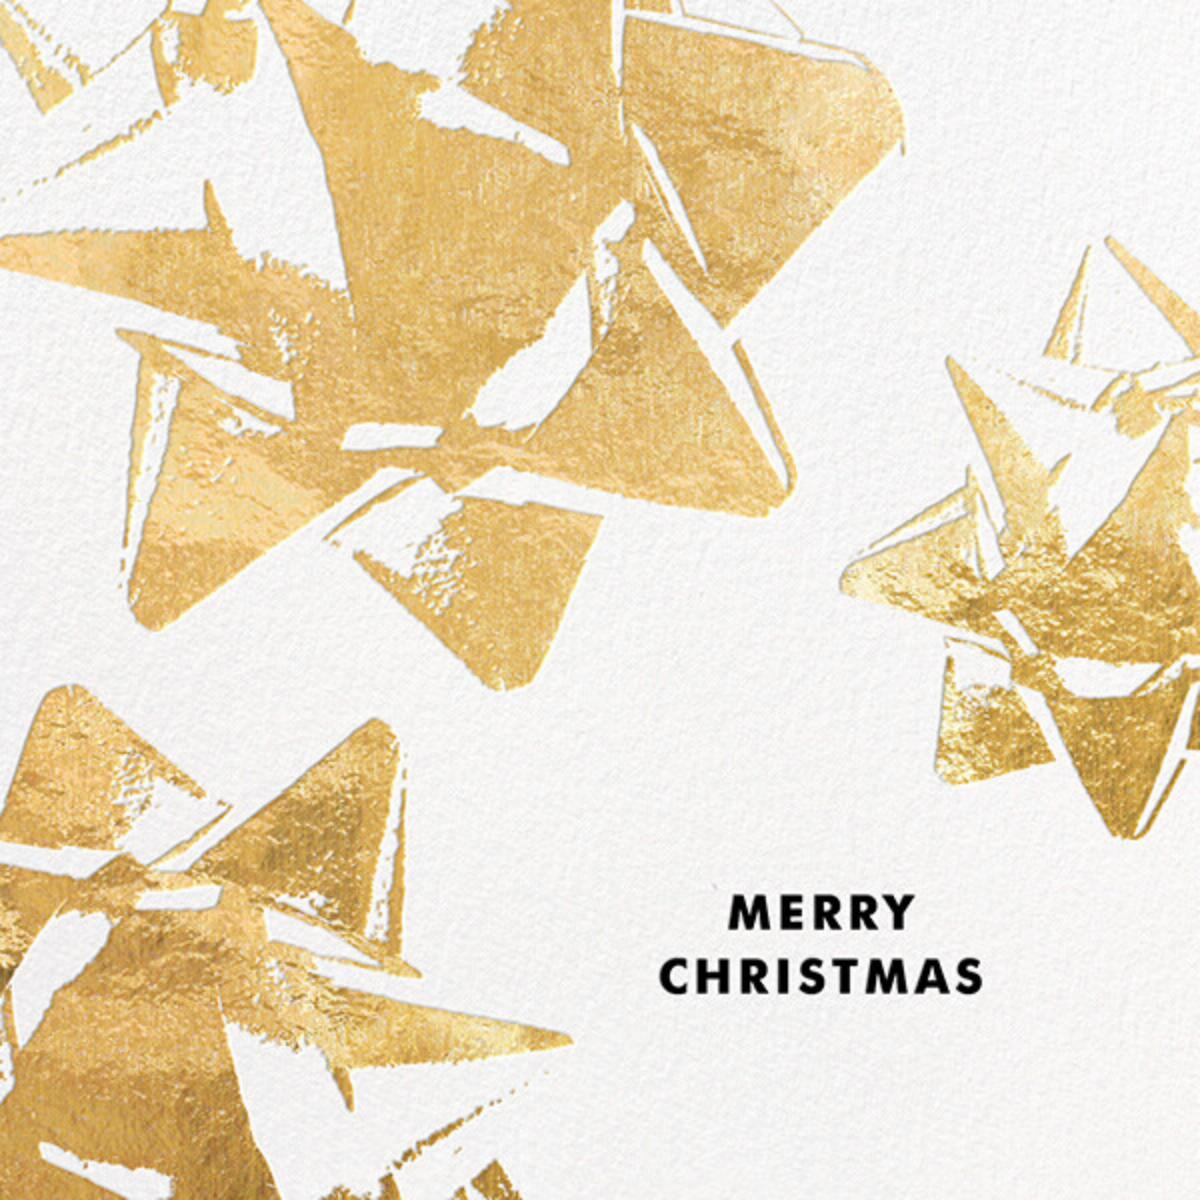 Bourgeois Bow (Christmas) - Gold - kate spade new york